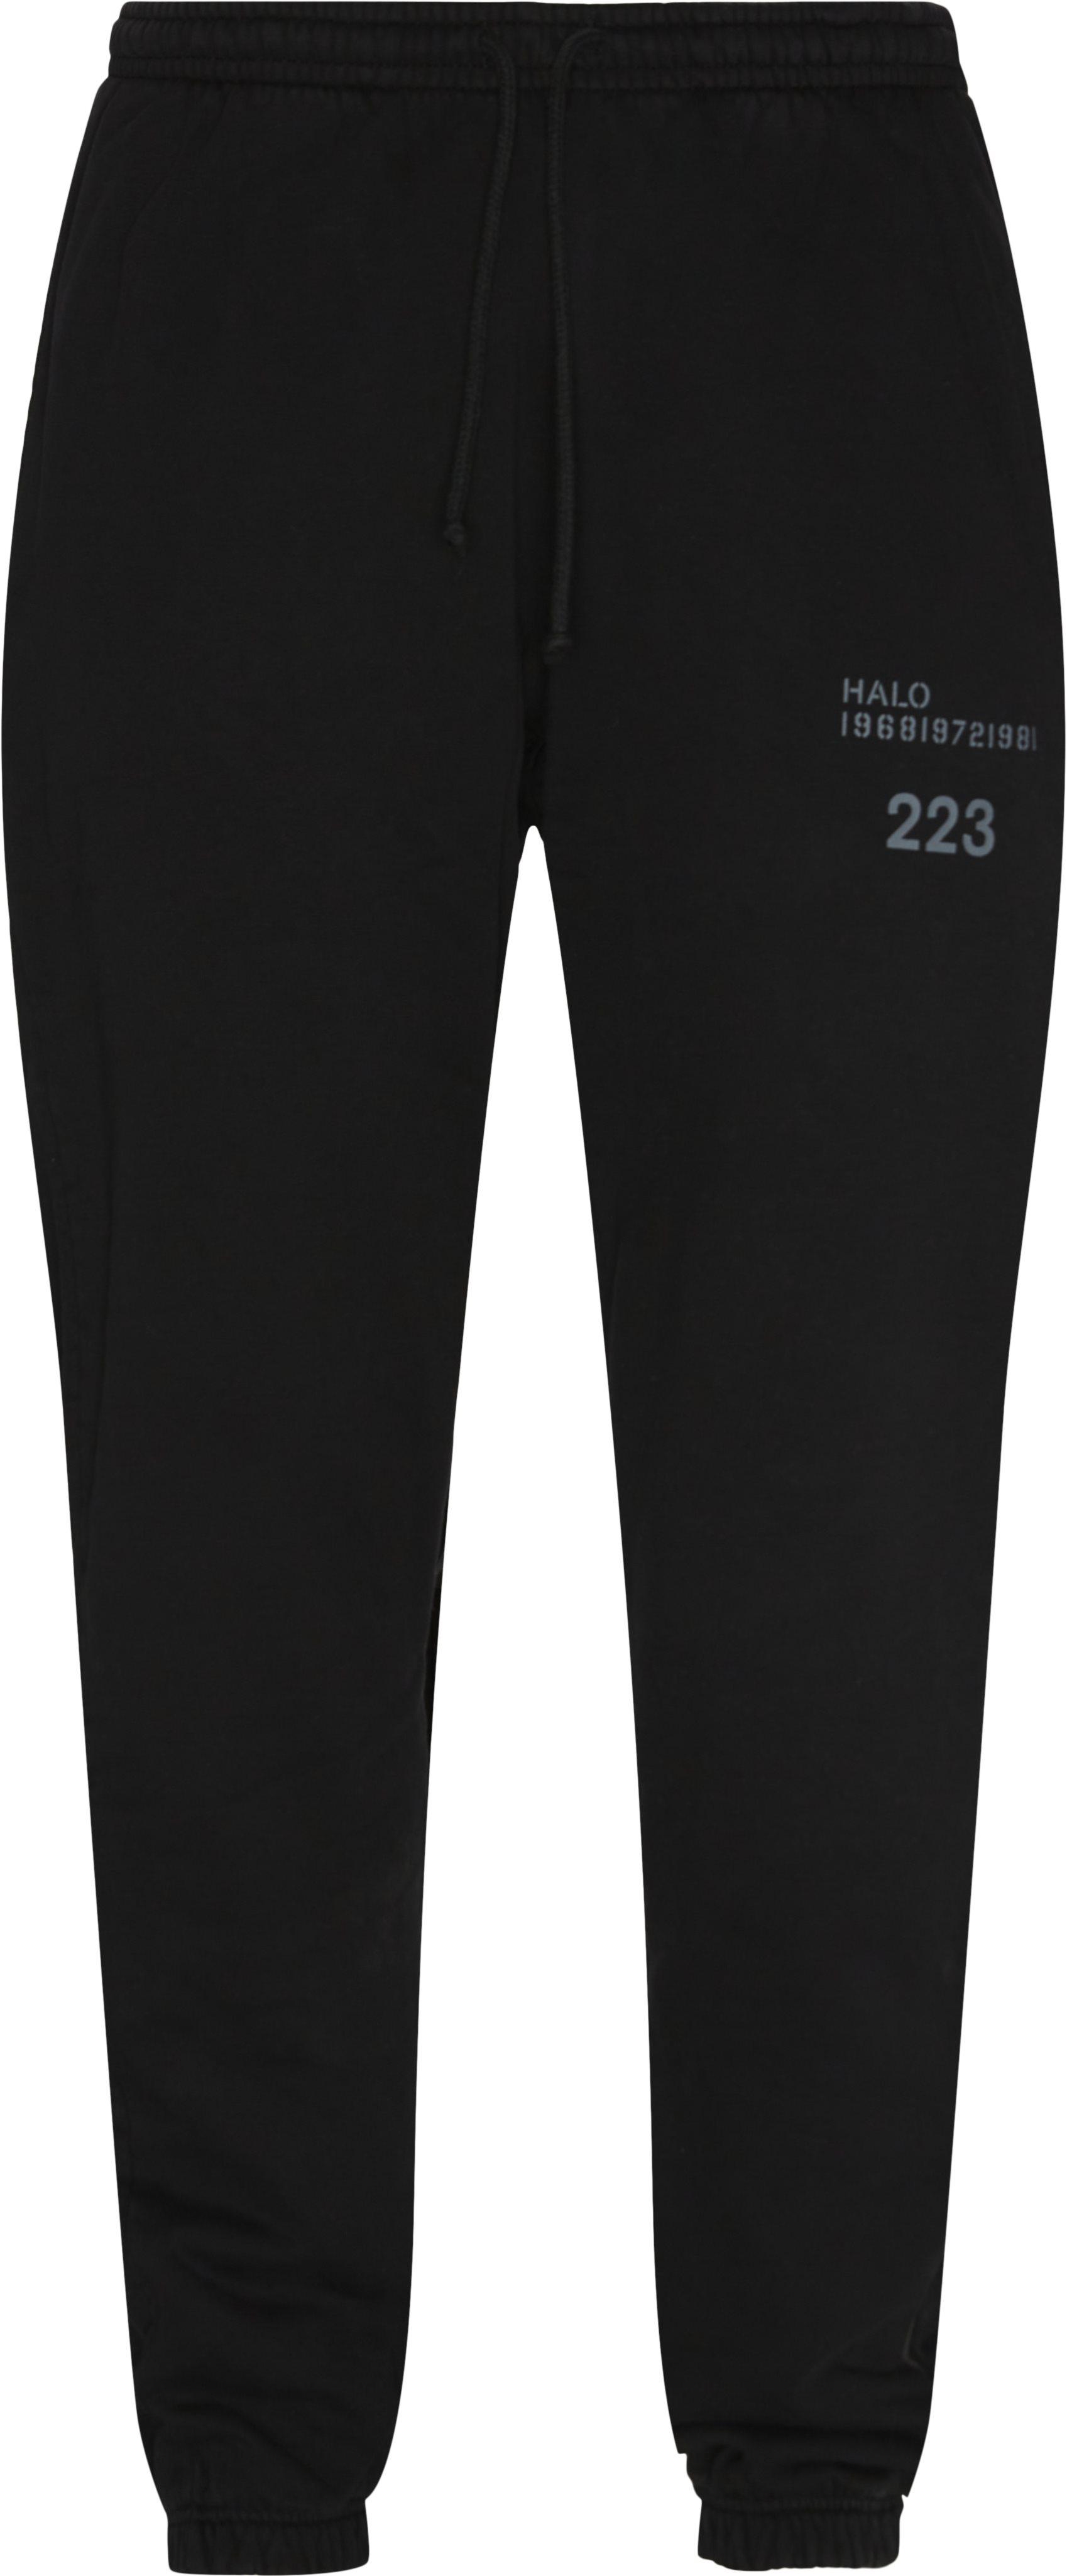 Cotton Sweatpant - Byxor - Regular fit - Svart